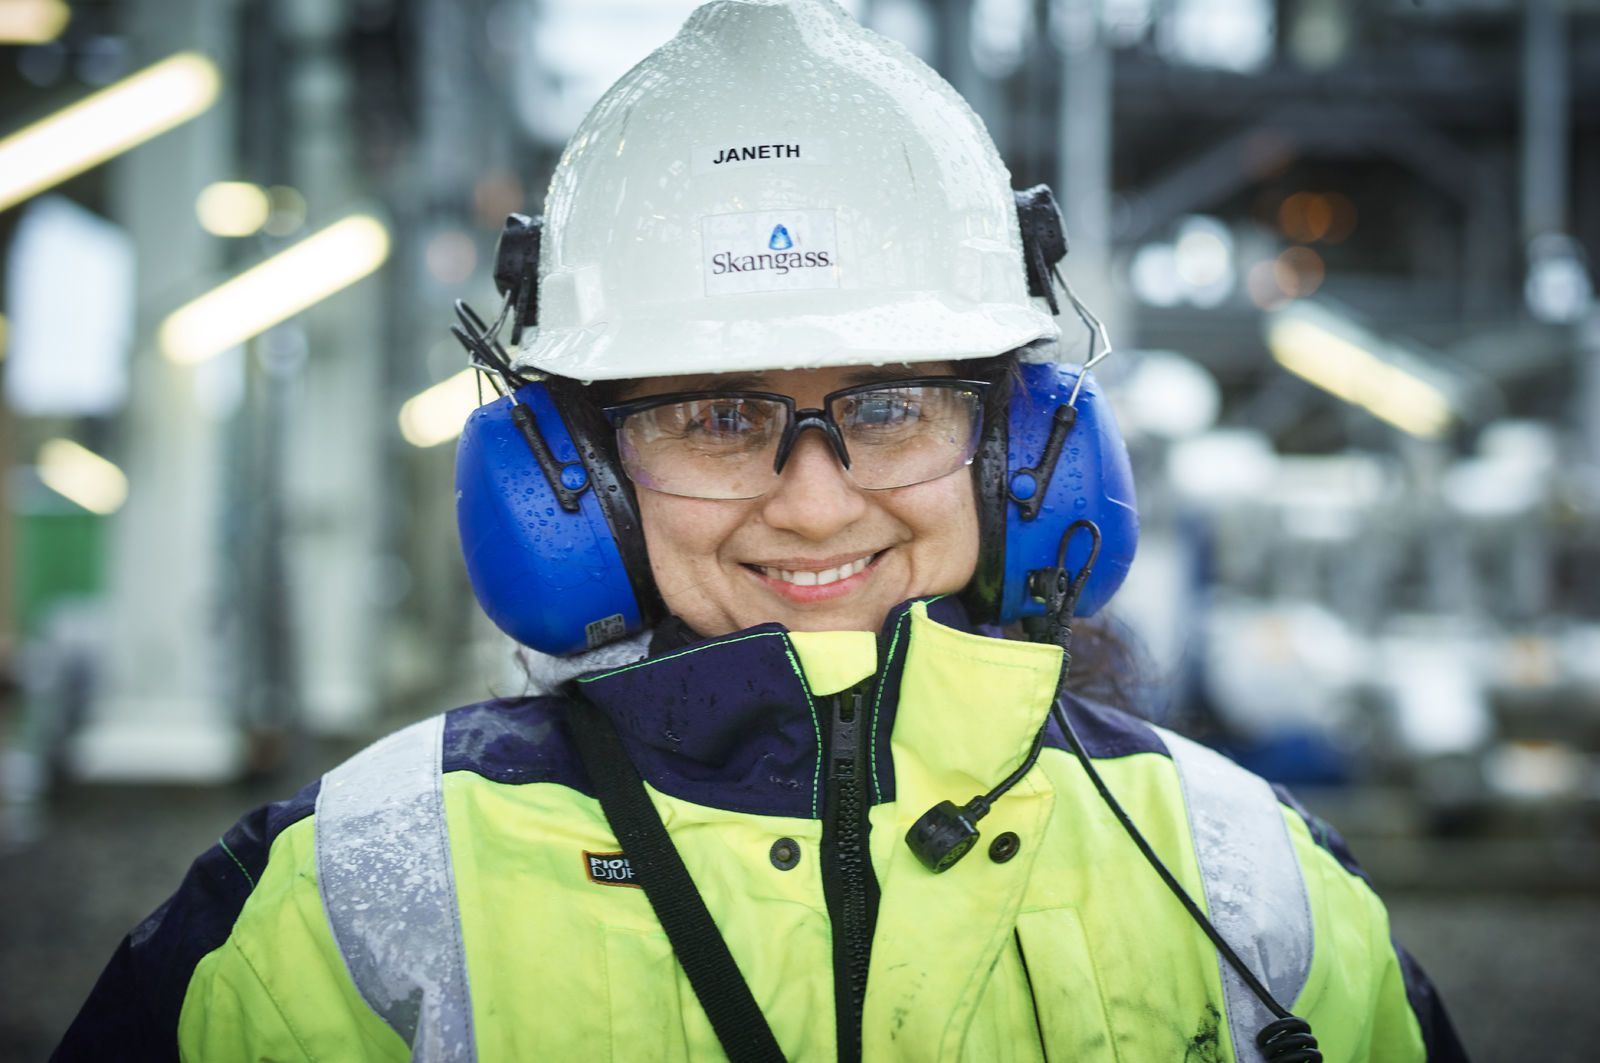 Portrett av en industriarbeider i arbeidsklær. Foto: Øivind Haug